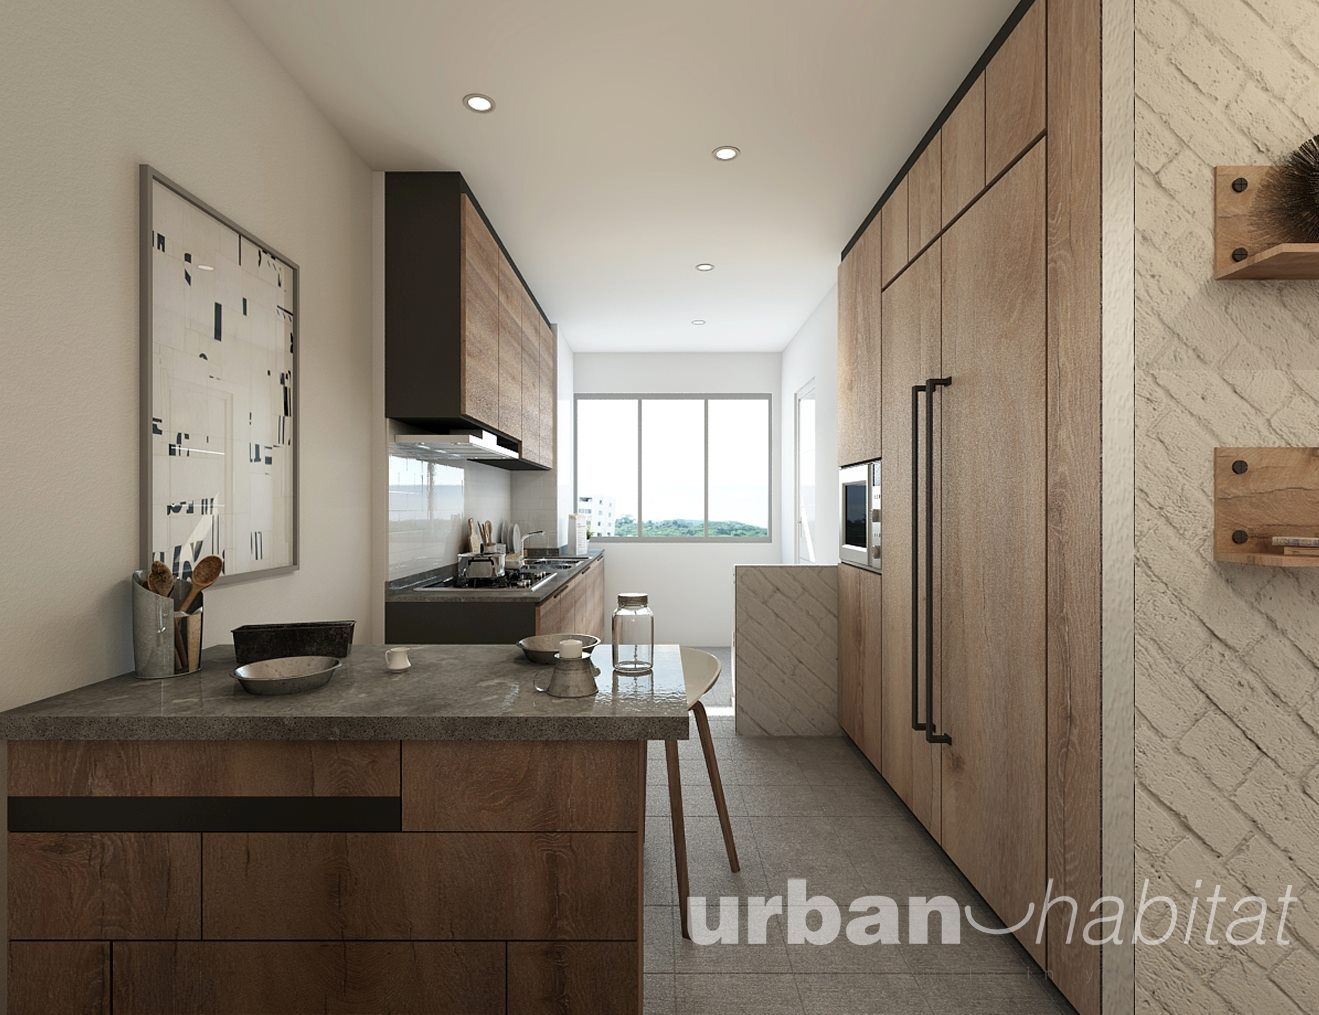 Hdb 3 Room Resale Modern Eclectic Serangoon North Interior